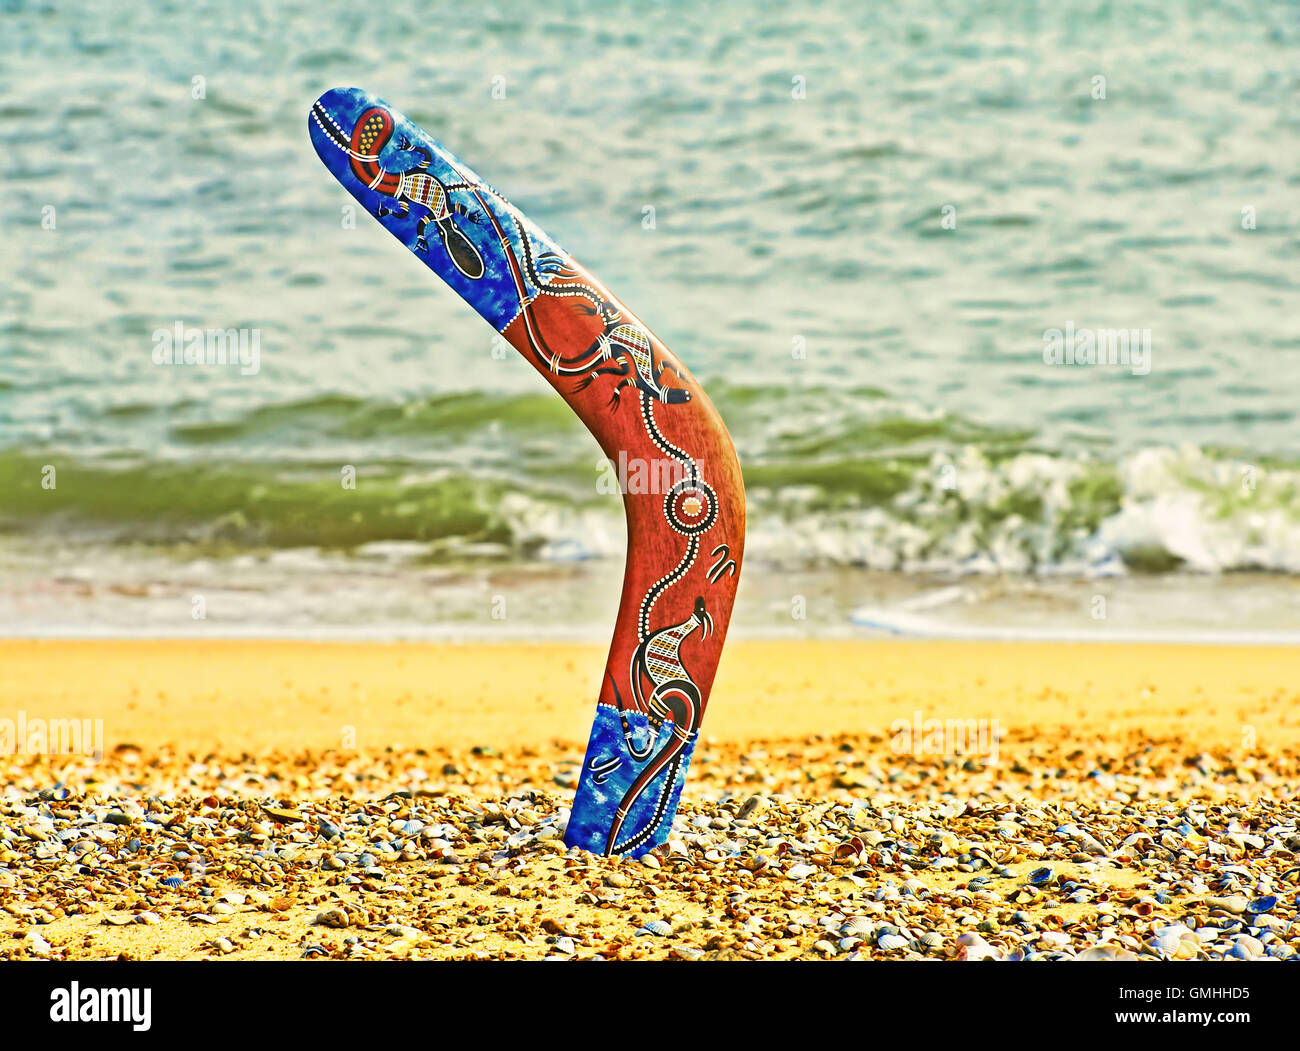 aborigine boomerang photos aborigine boomerang images alamy. Black Bedroom Furniture Sets. Home Design Ideas